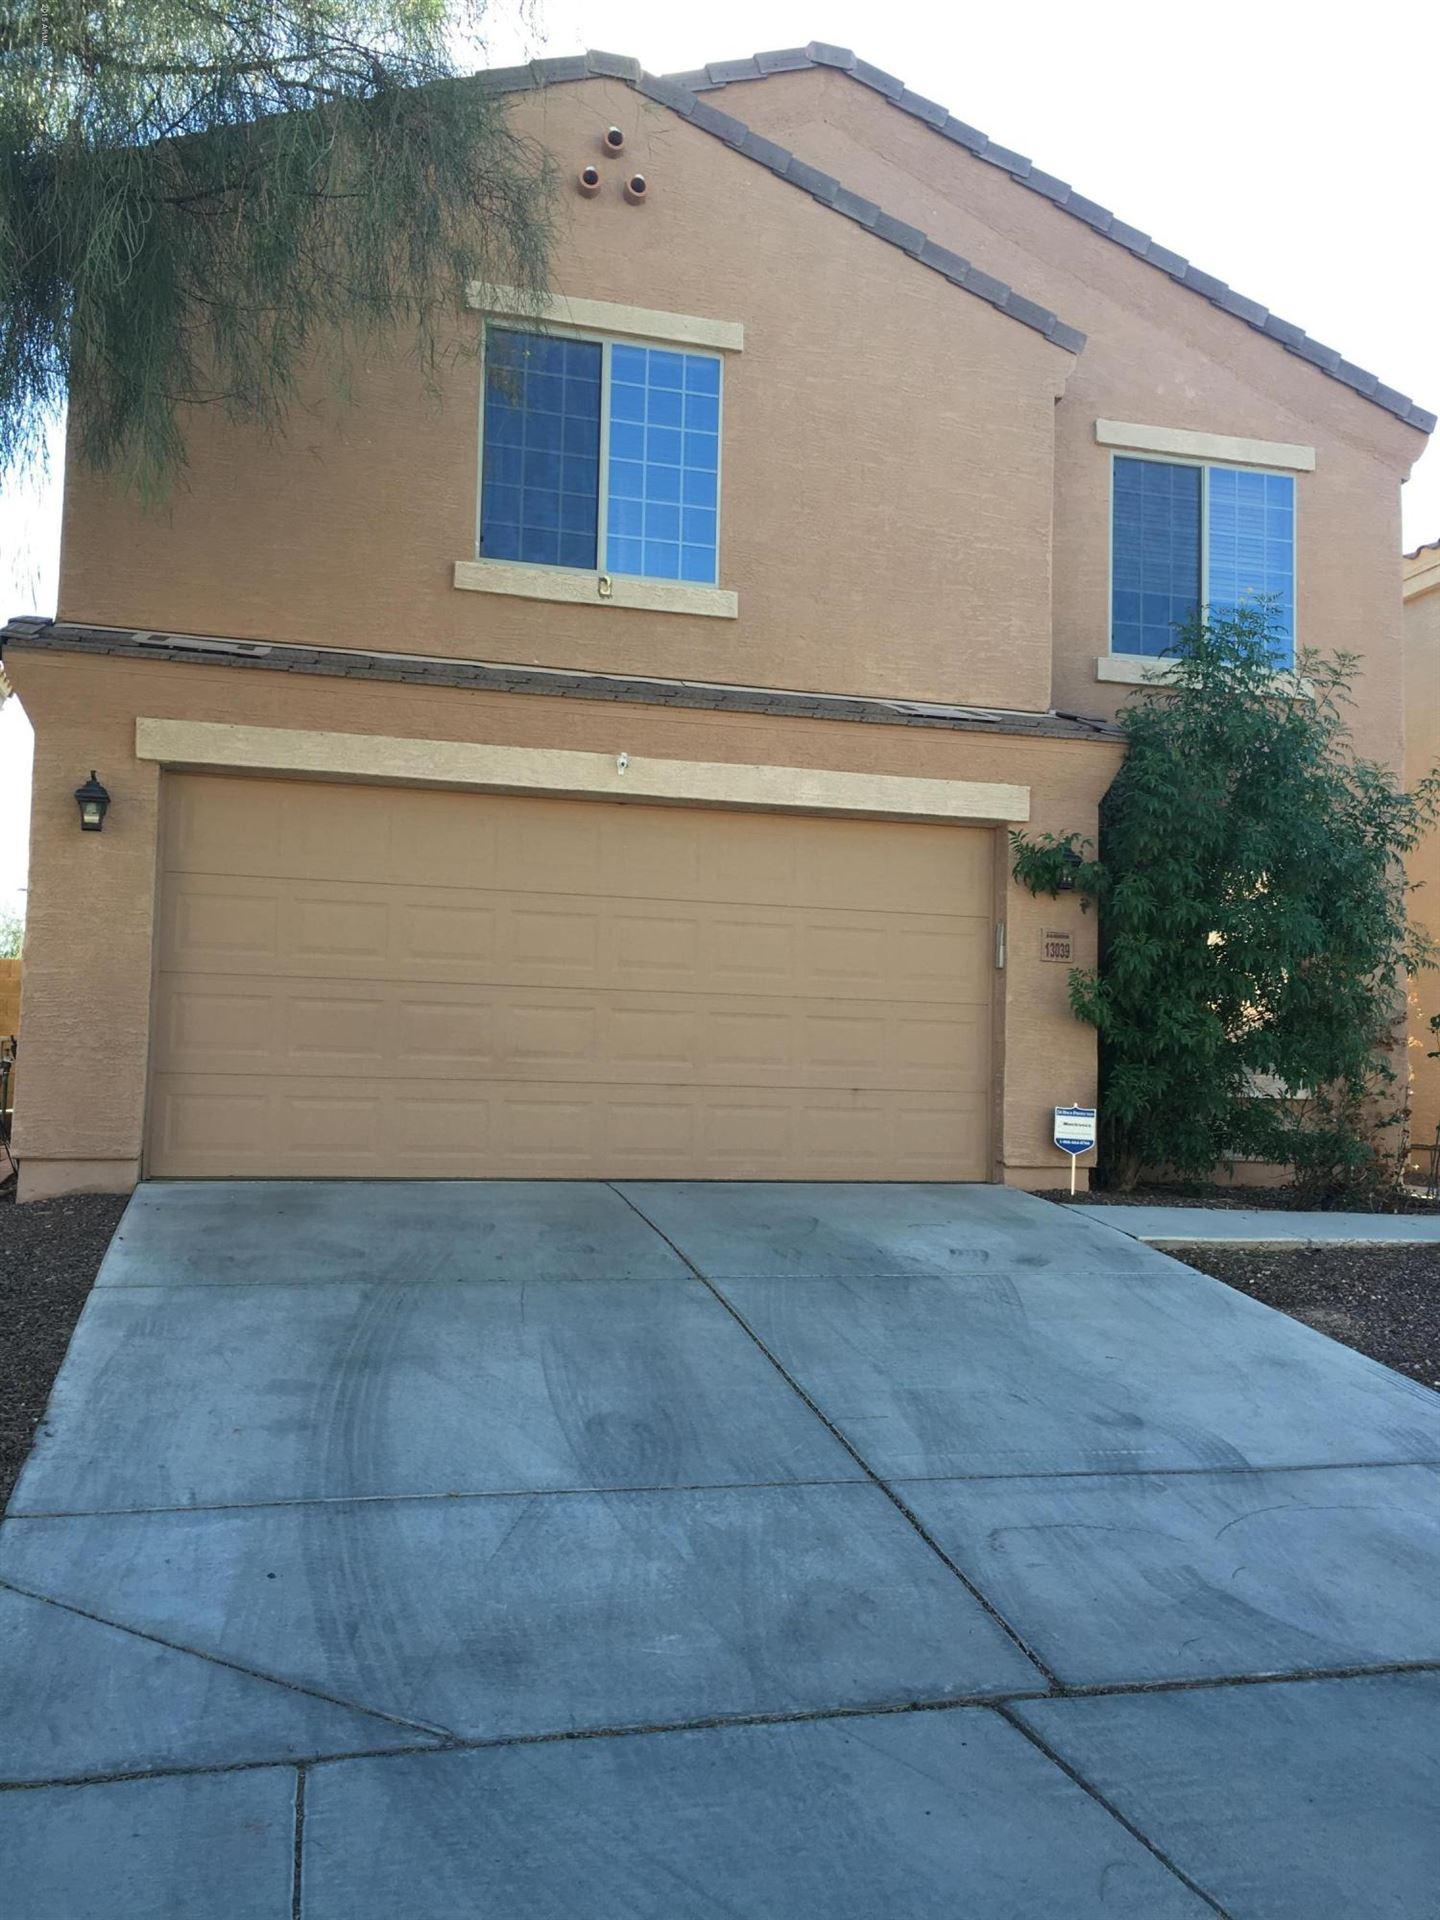 Photo of 13039 W LAWRENCE Road, Glendale, AZ 85307 (MLS # 6296560)